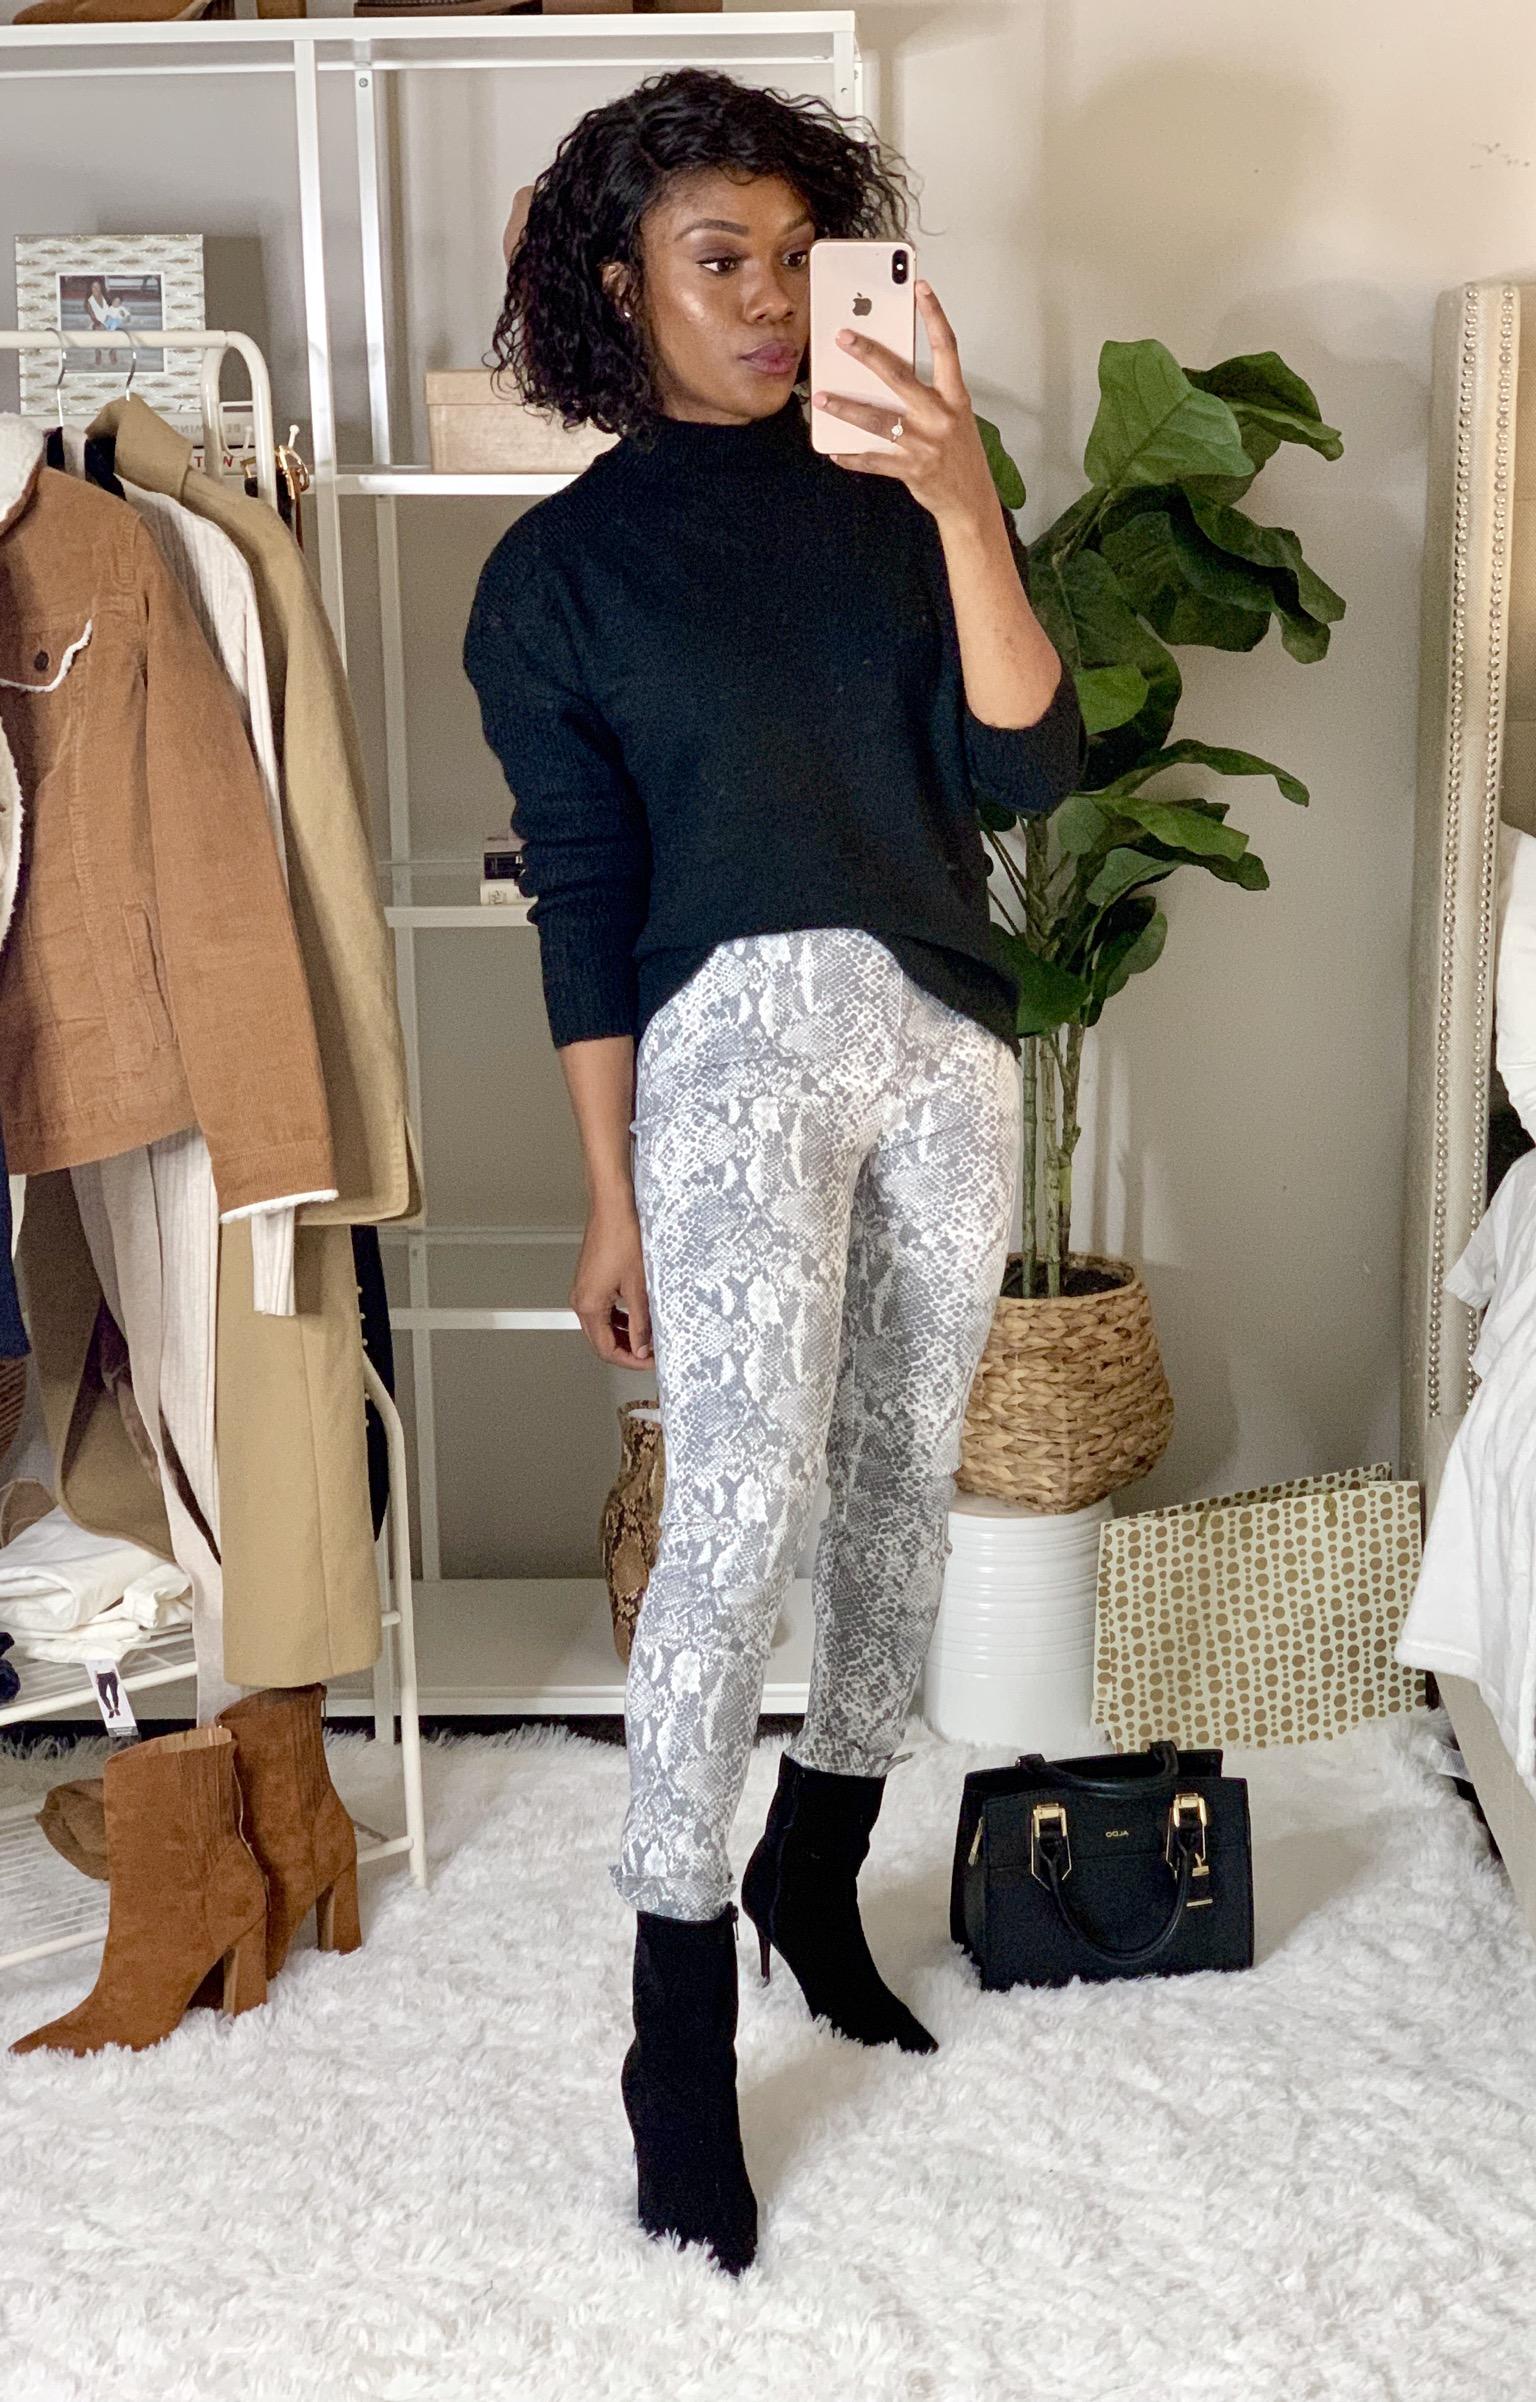 Walmart snakeskin leggings paired with Time & Tru turtleneck sweater